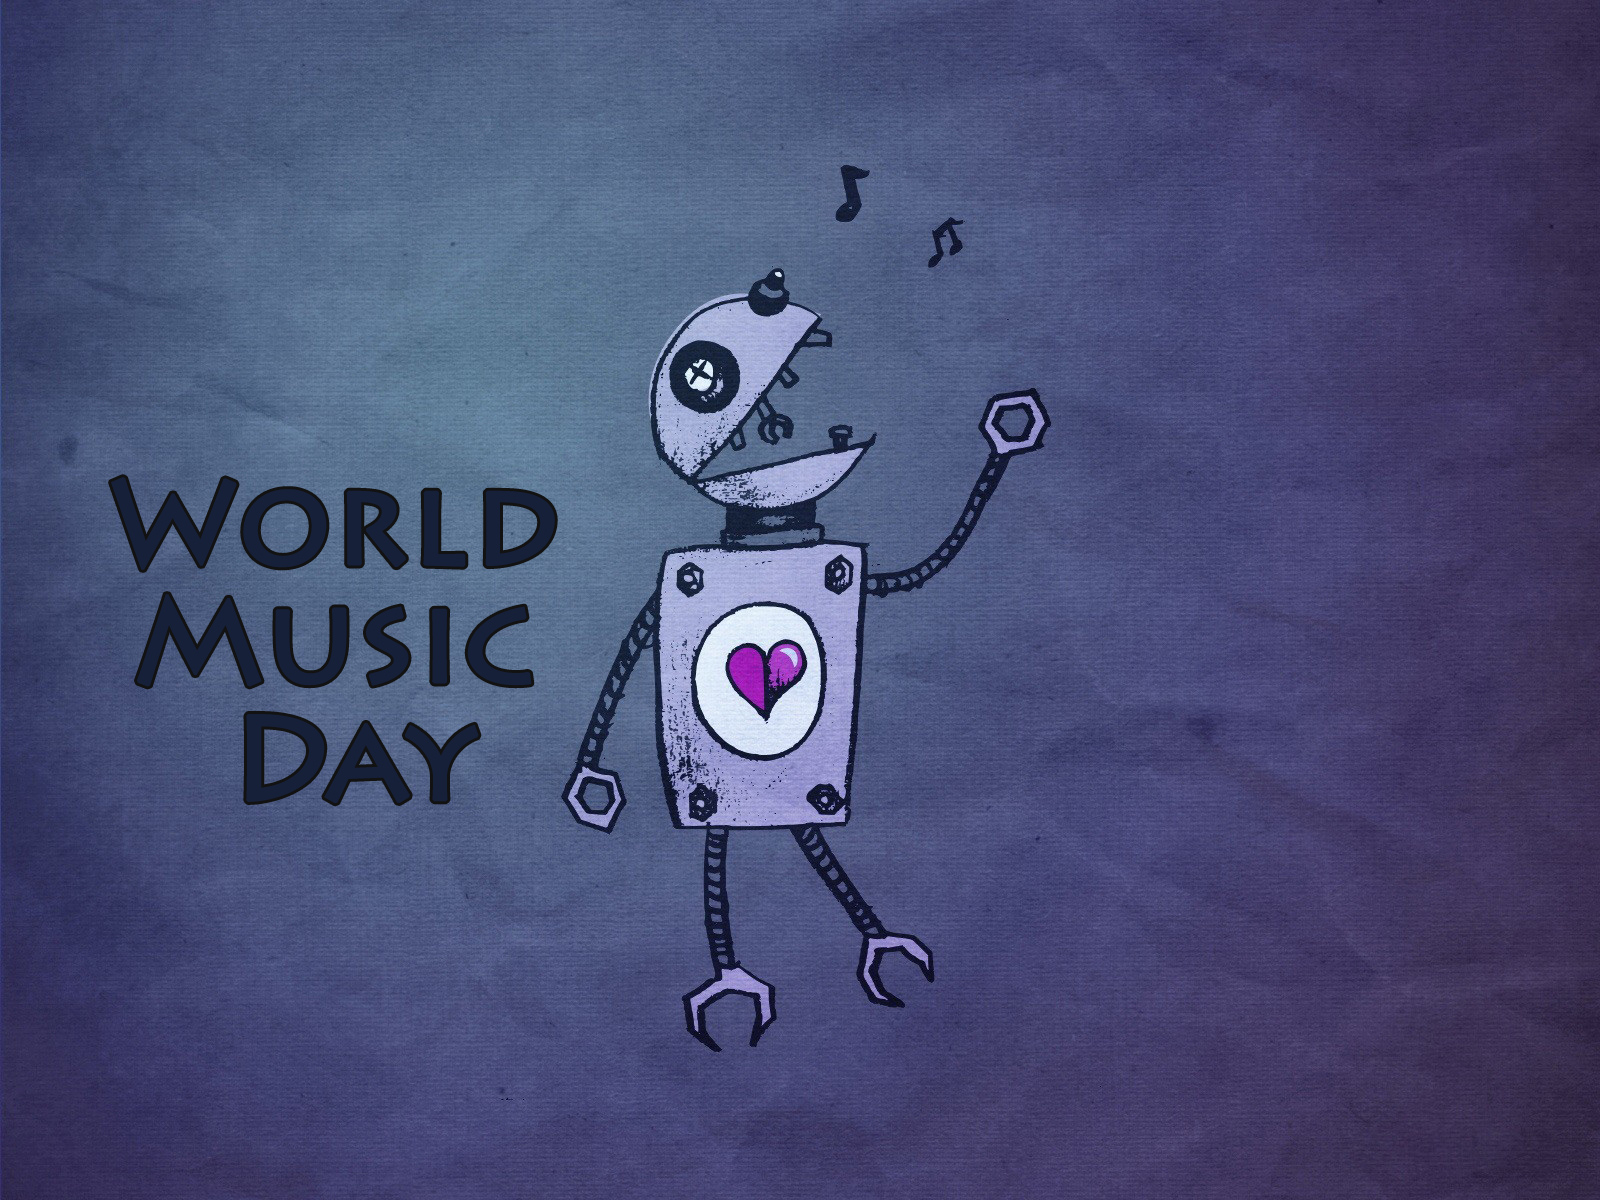 World Music Day robo hd wallpaper 1600x1200